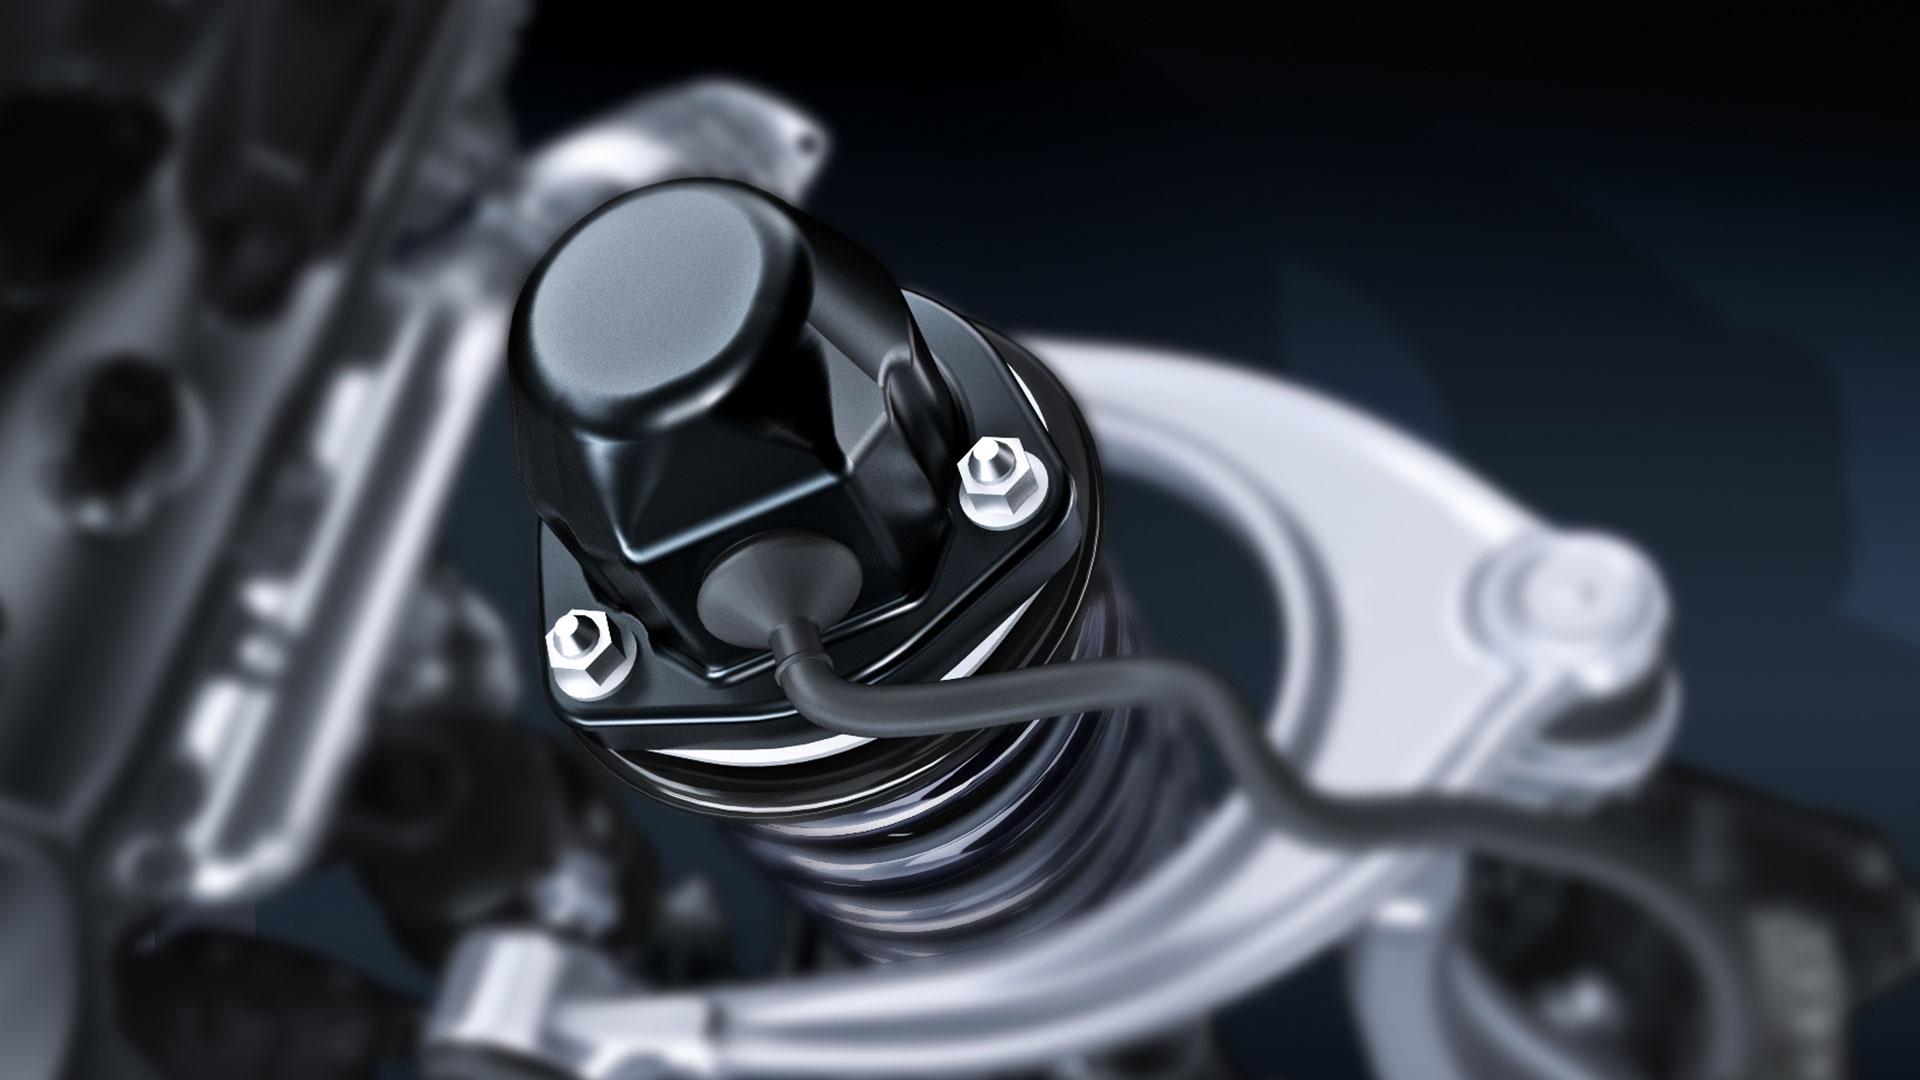 2017 lexus gs f features adaptive variable suspension